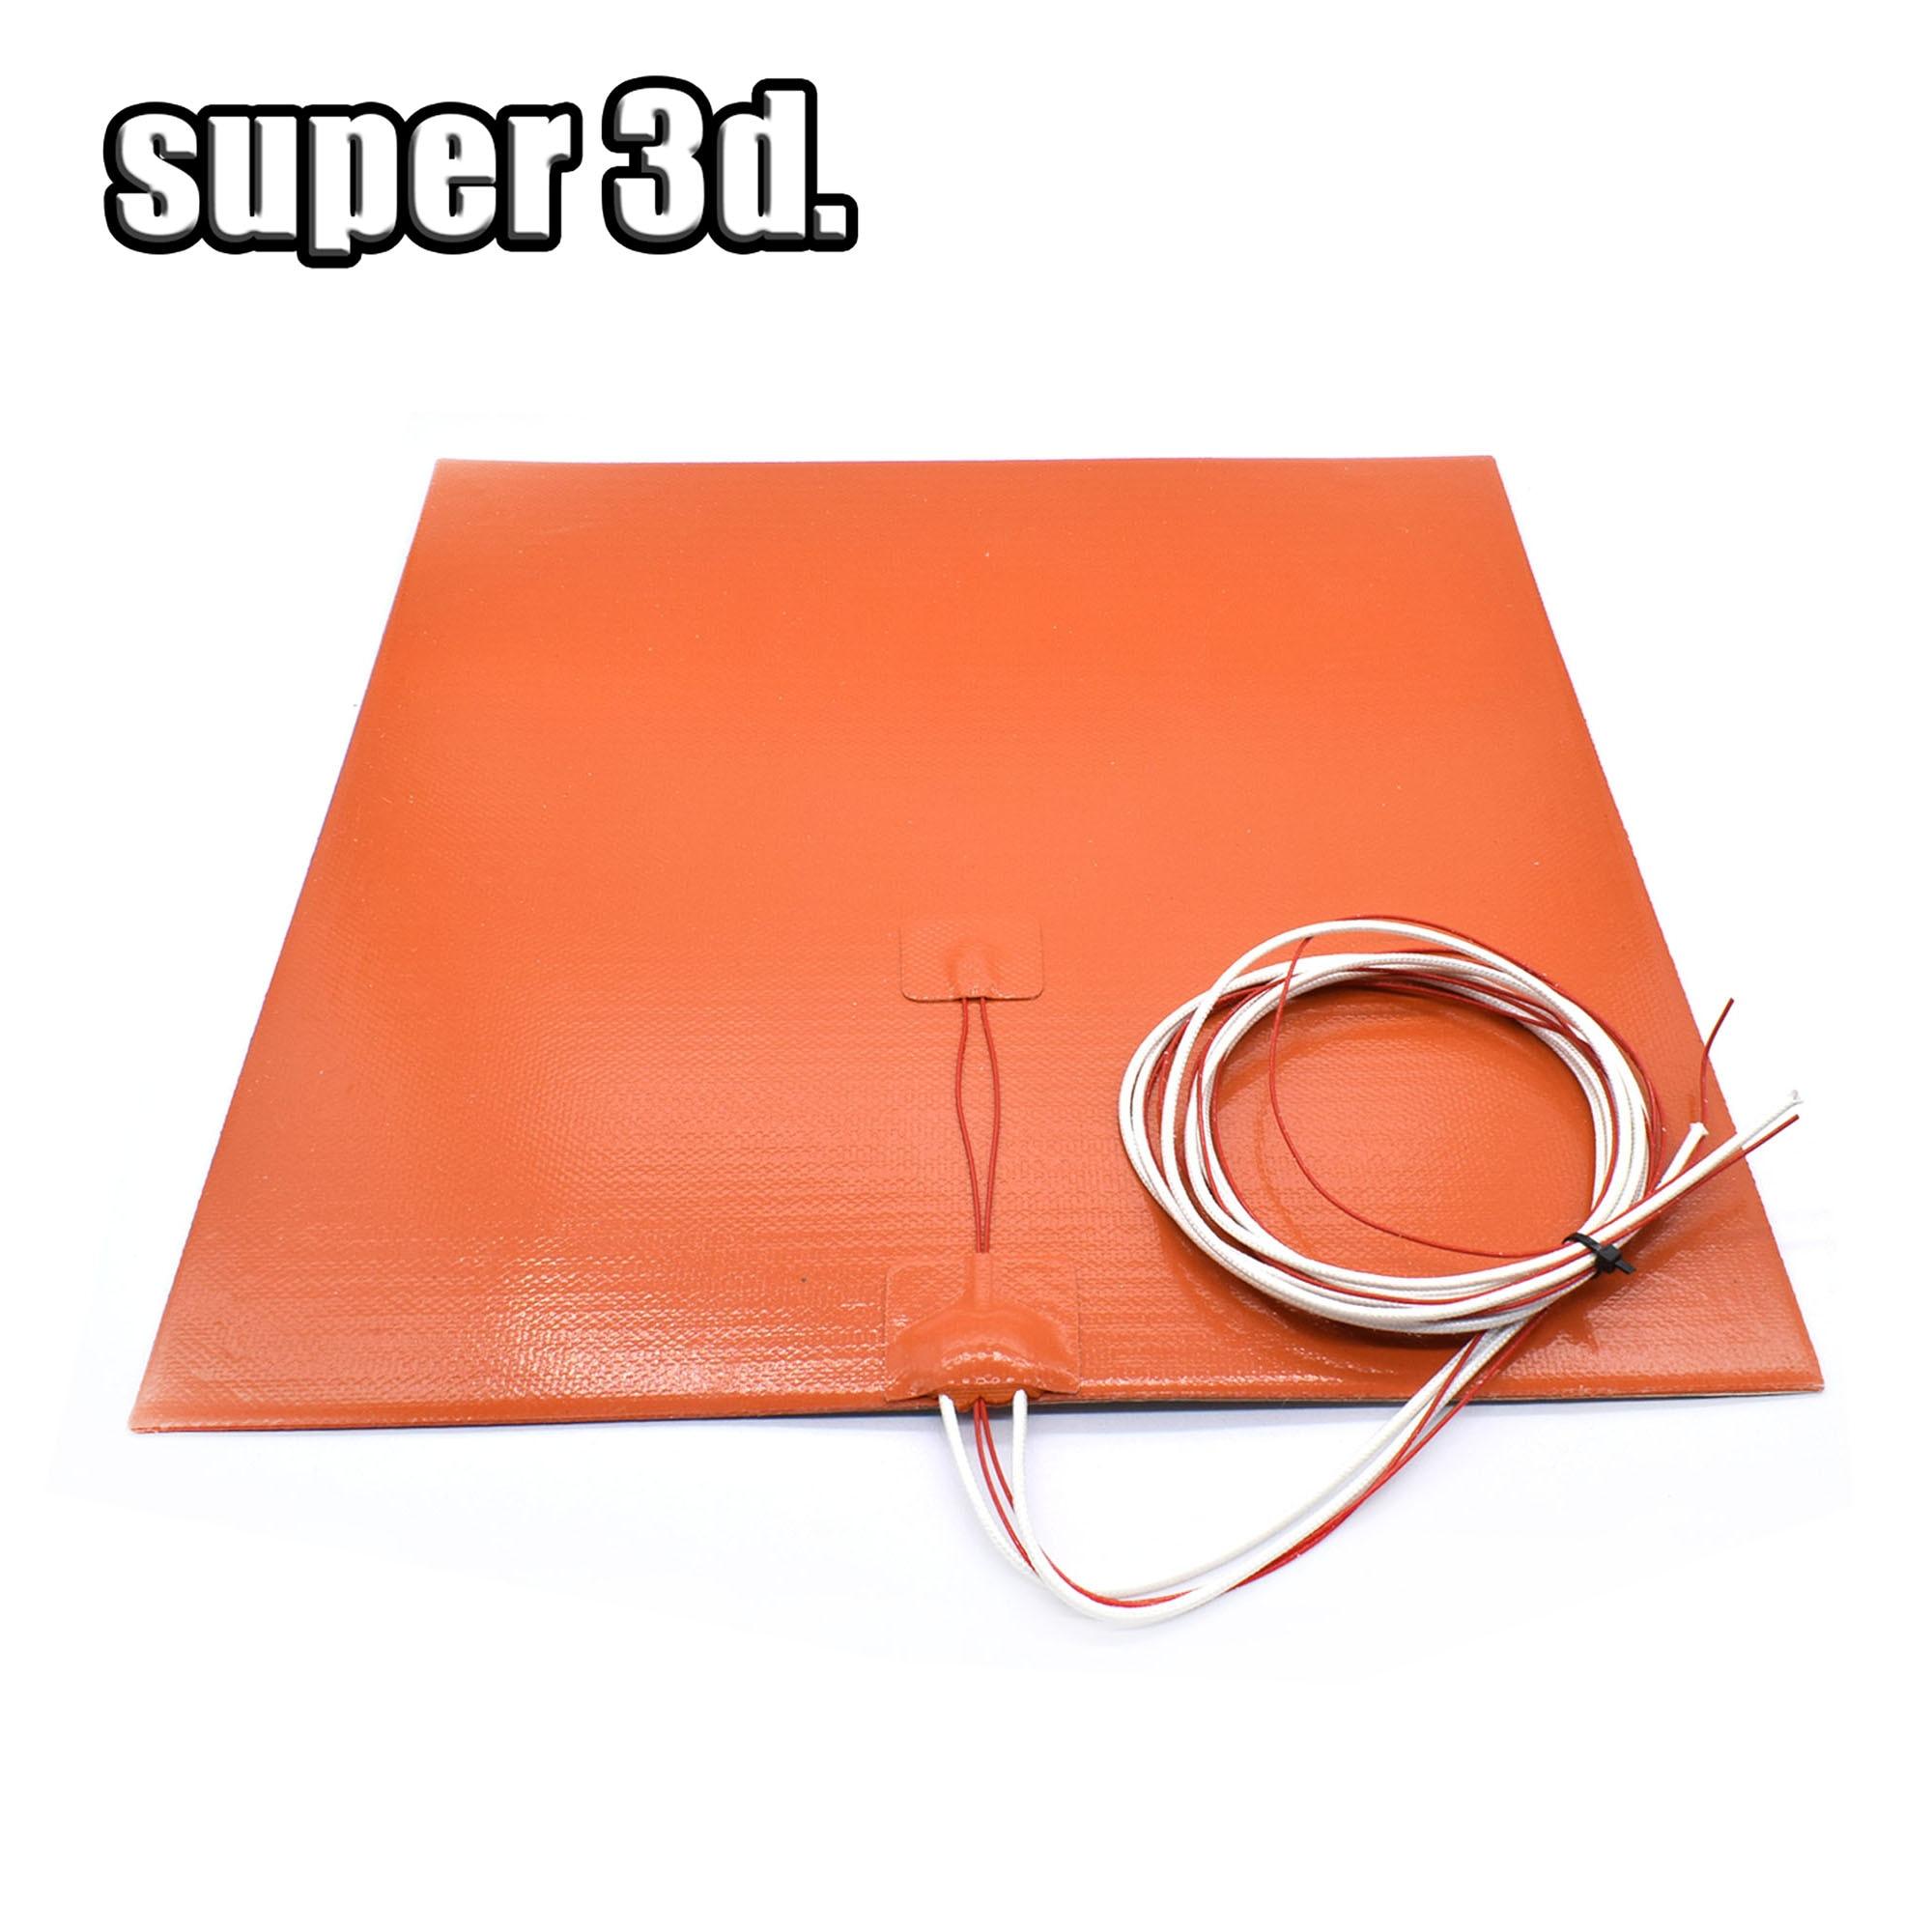 Almohadilla calefactora de cama de silicona Flexible impermeable 200x20 0/220*220/300x30 0/400mm 12V/220/110 V para piezas de impresora 3D cama caliente